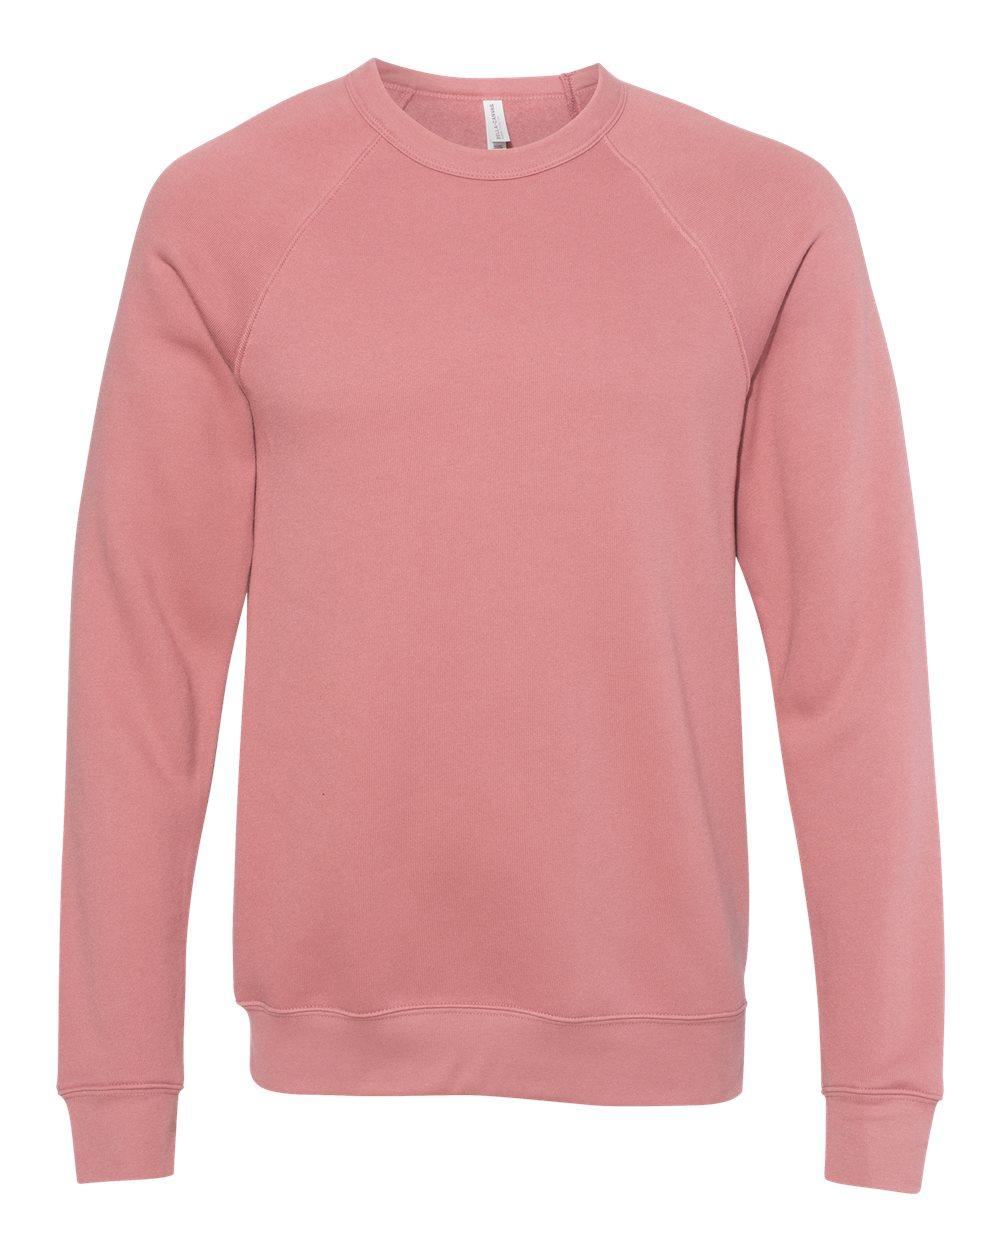 Bella-Canvas-Unisex-Sponge-Fleece-Crewneck-Sweatshirt-Top-Blank-3901-up-to-2XL thumbnail 49